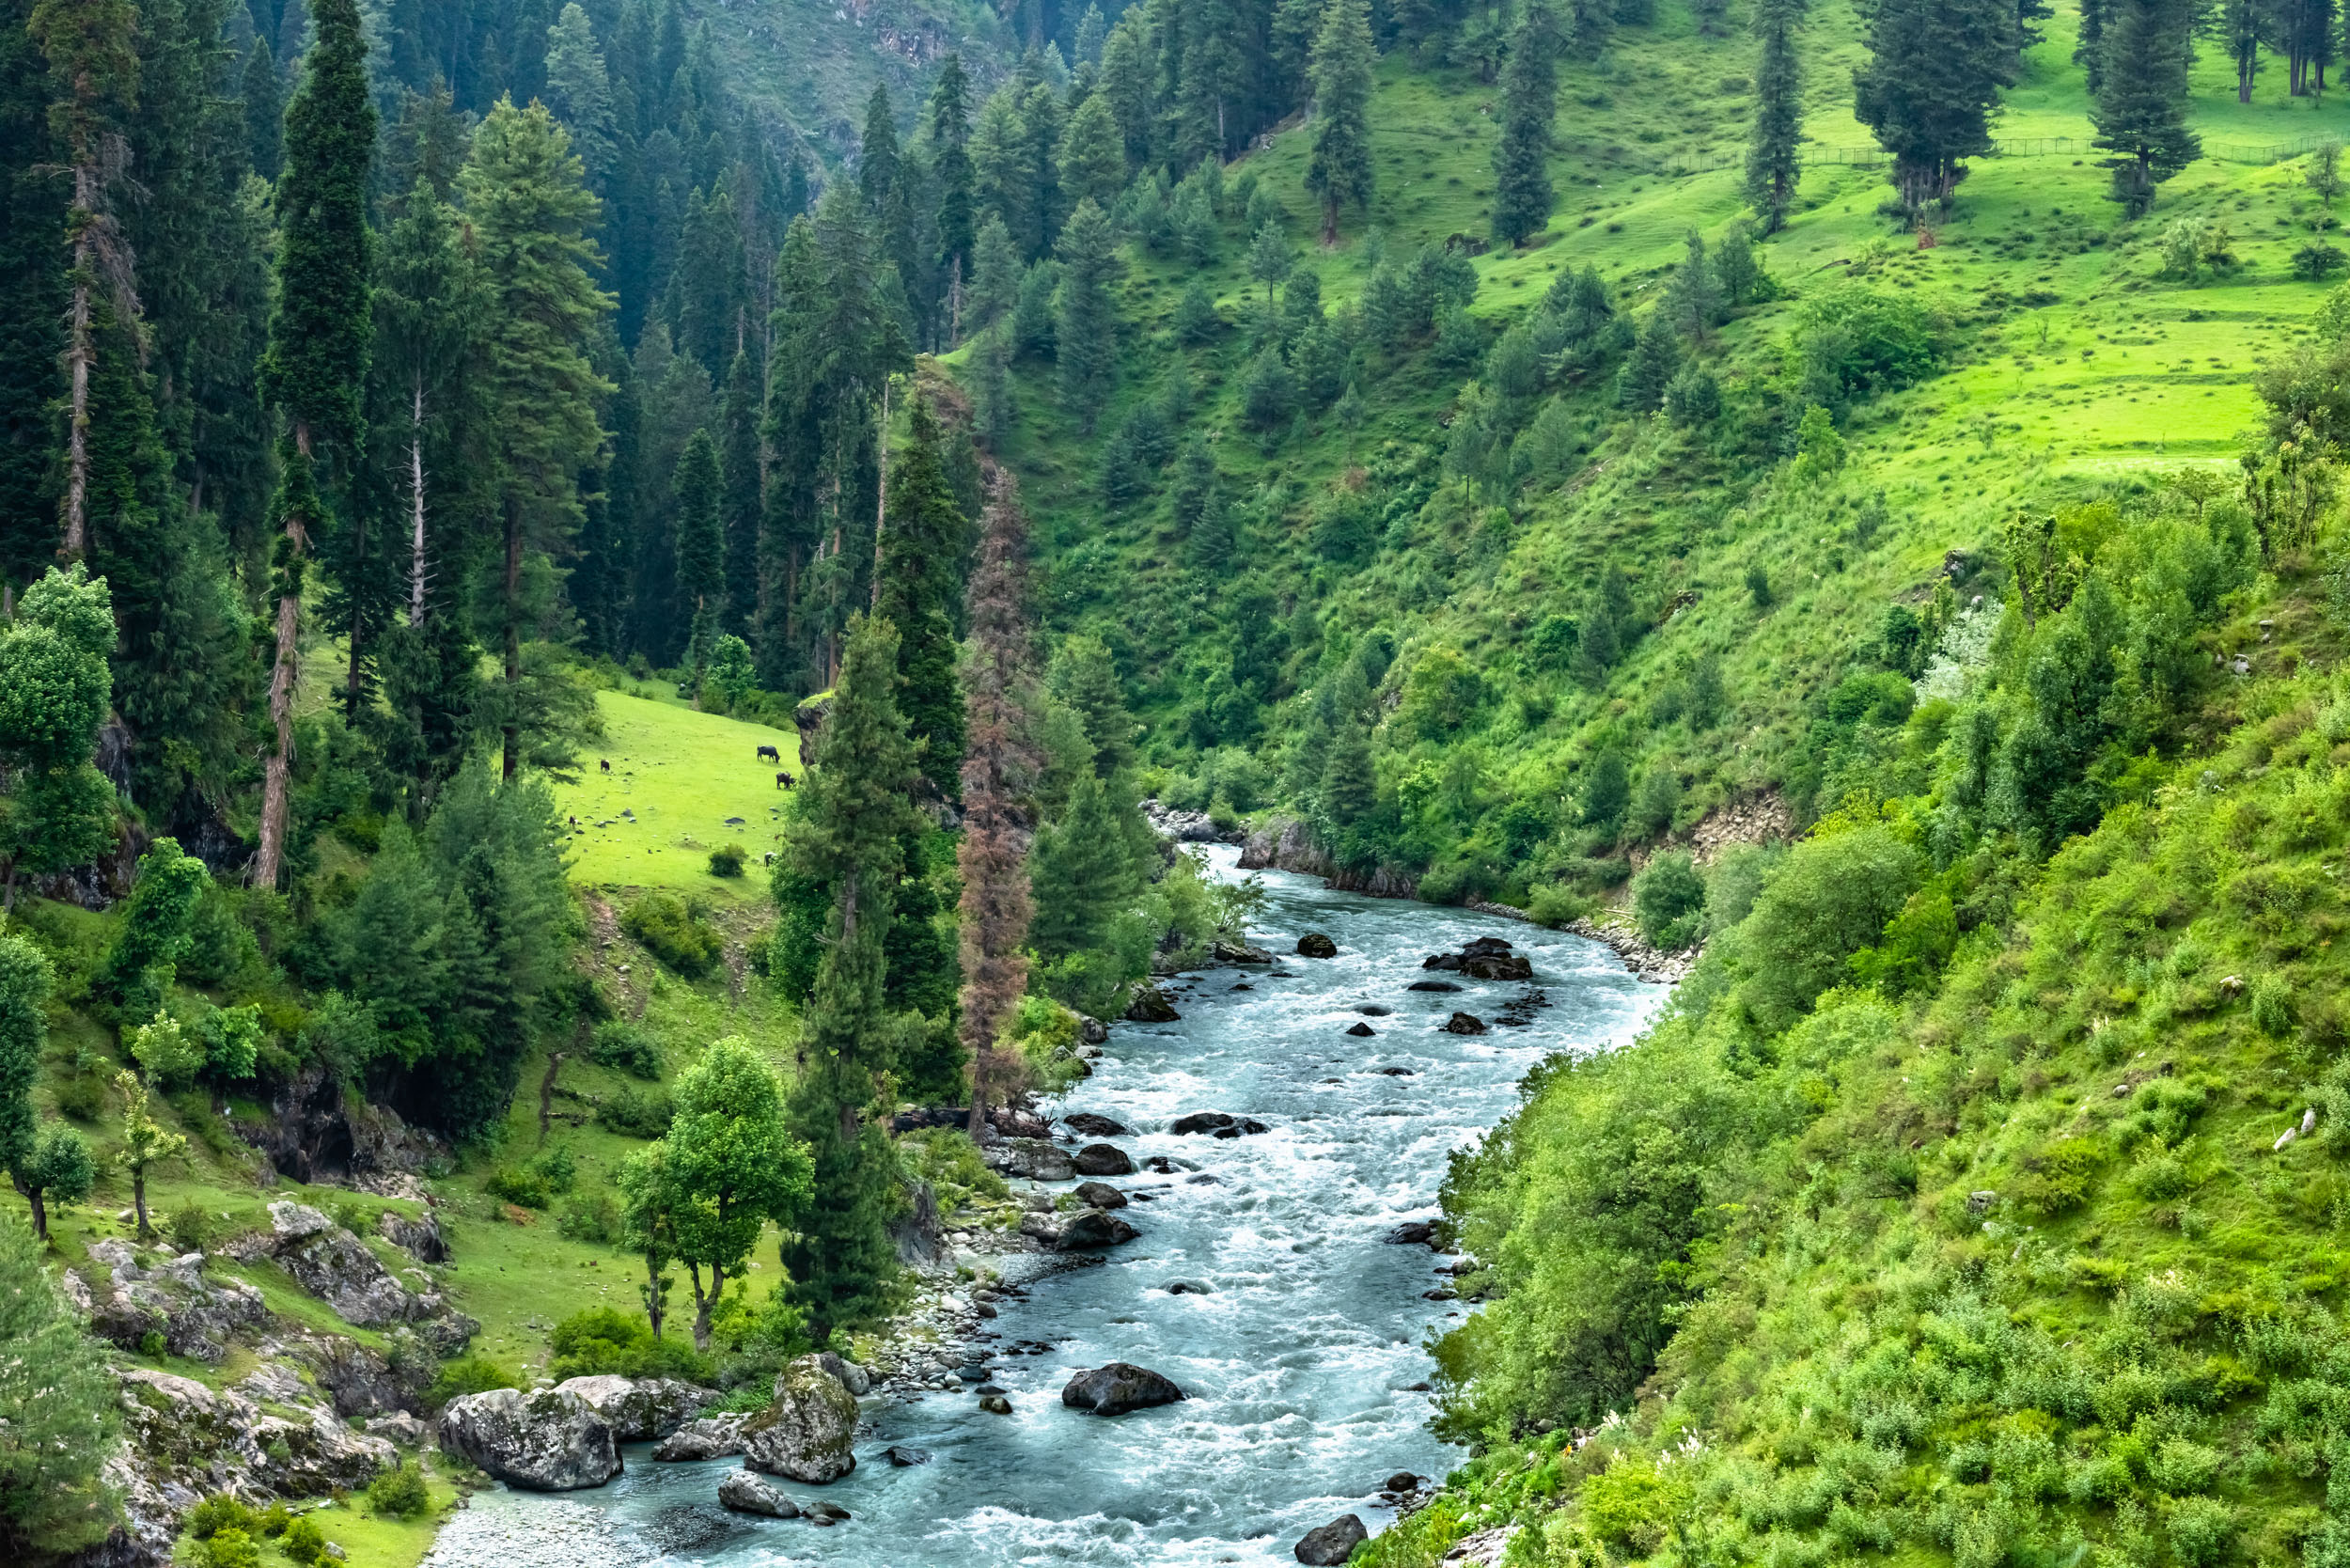 Streams and green meadows in Aru Valley